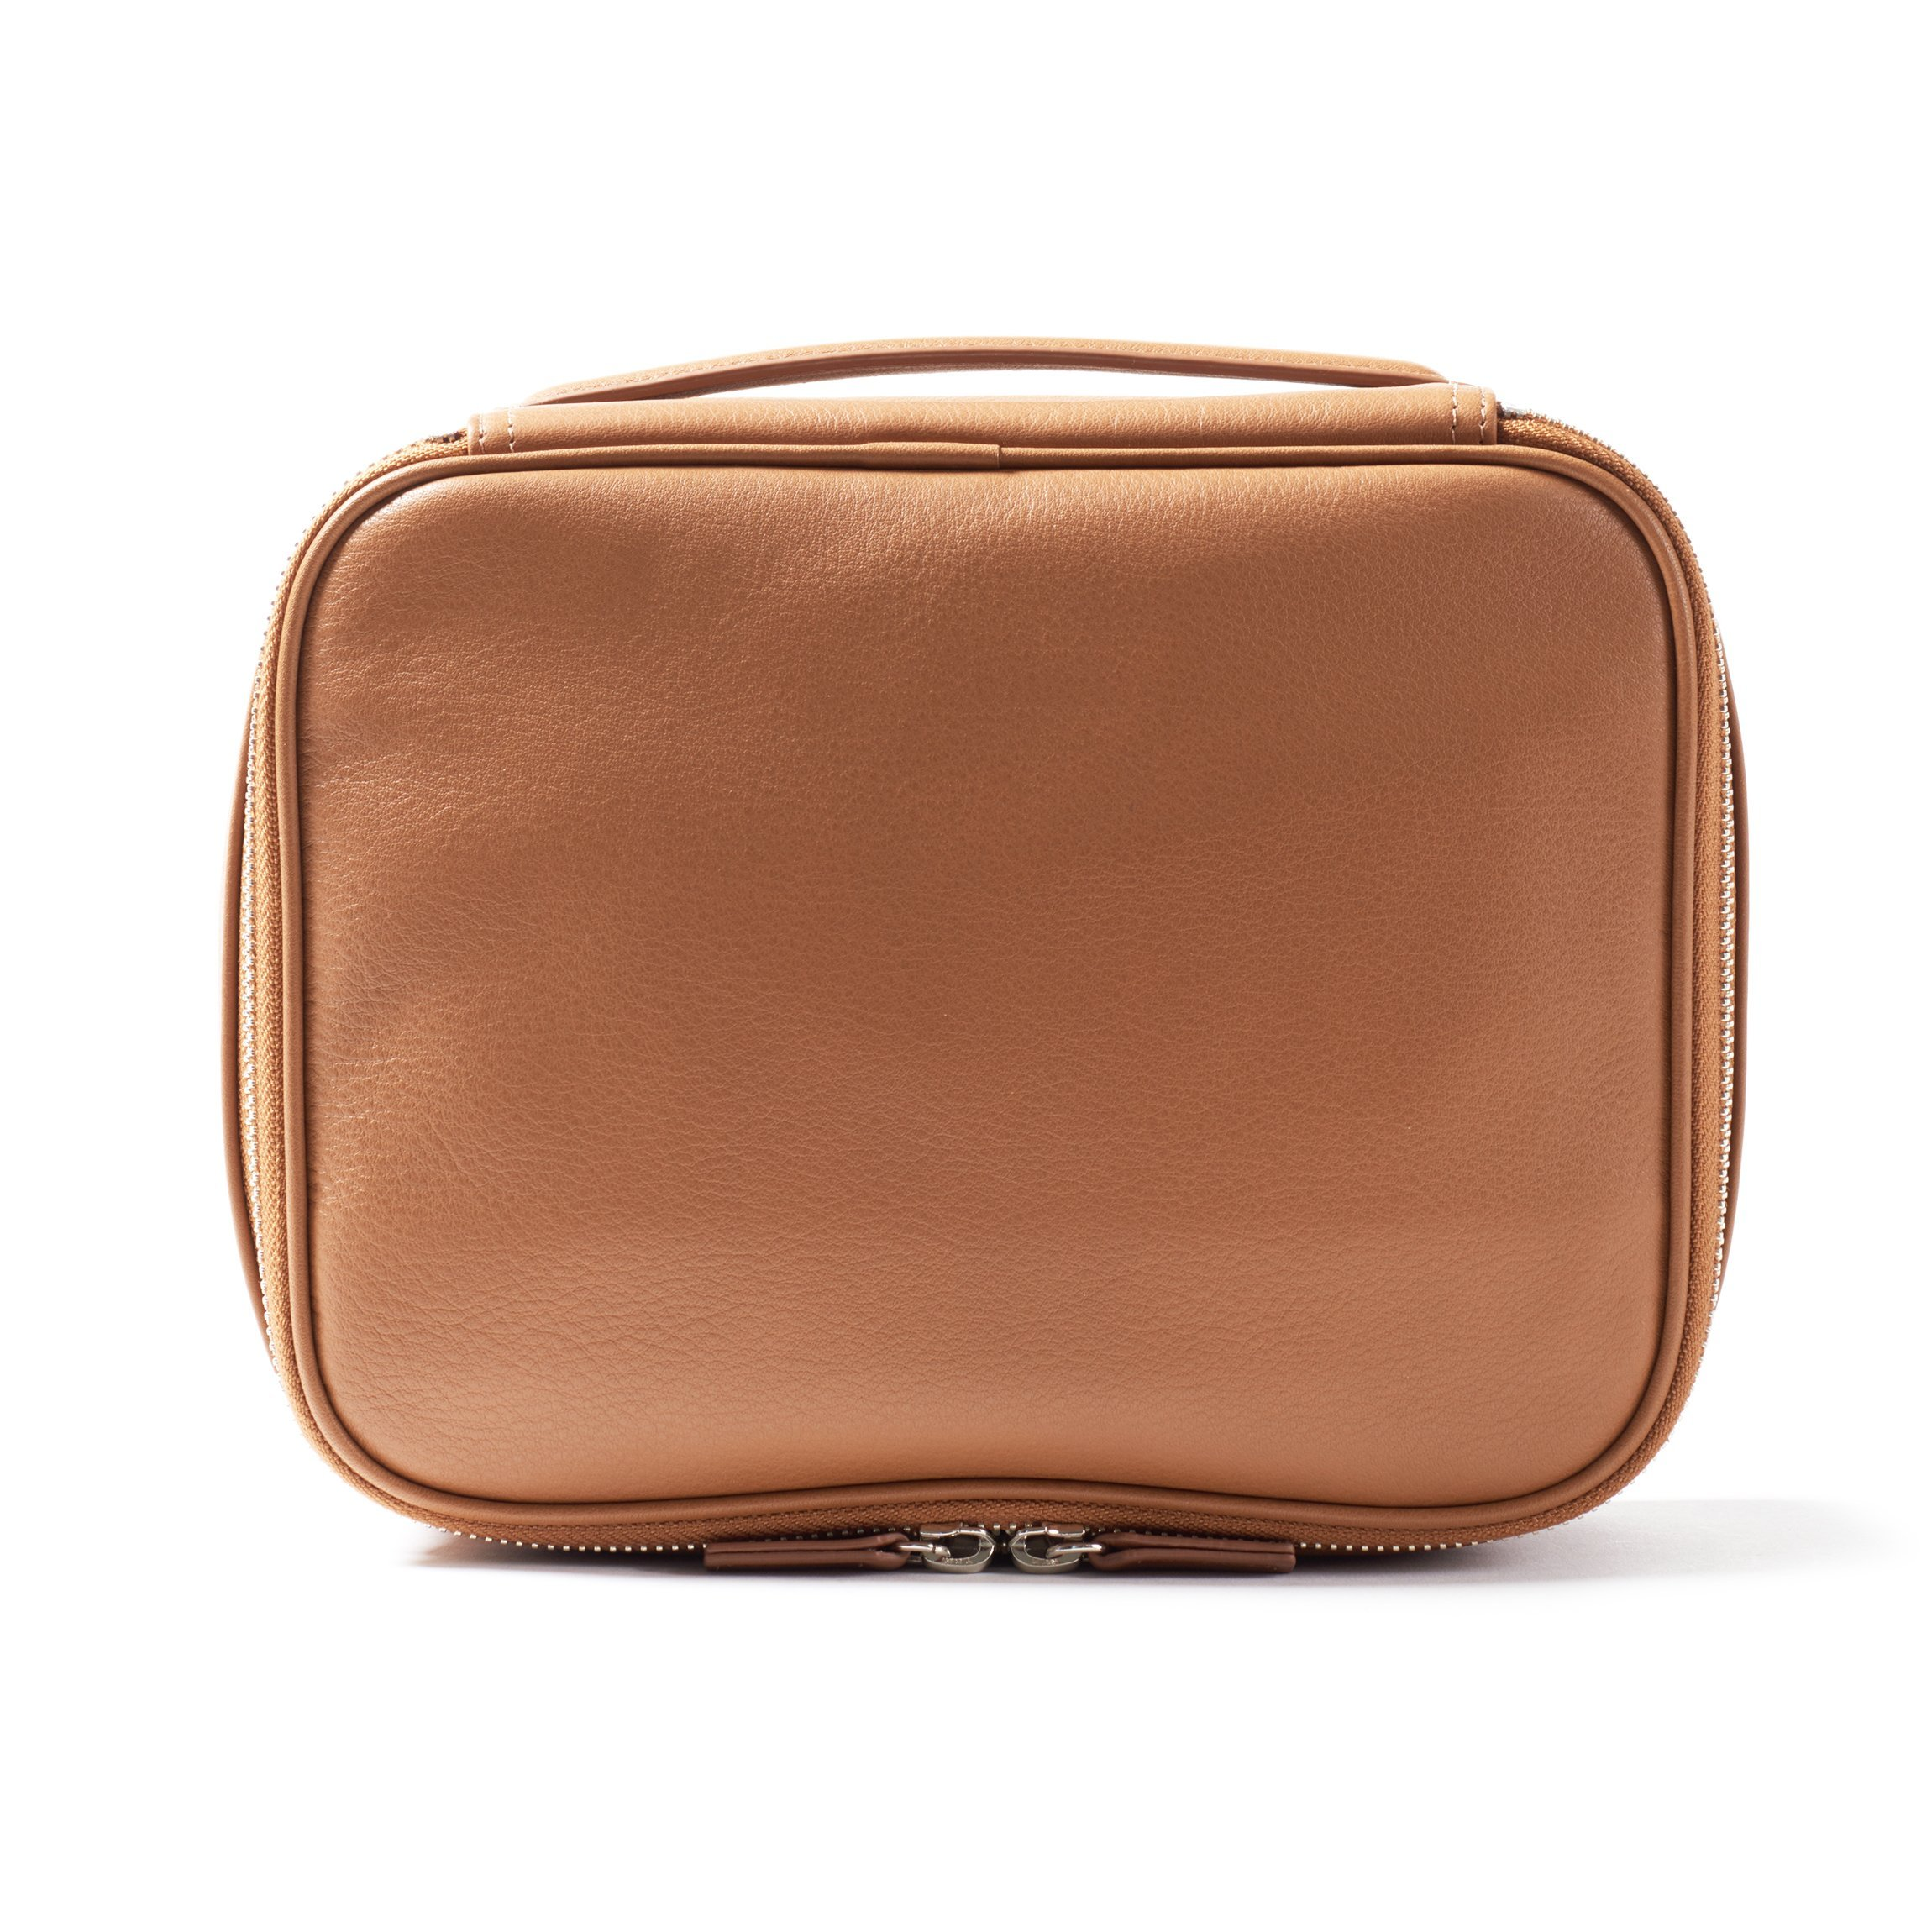 Leatherology Large Travel Organizer - Full Grain Leather Leather - Cognac (brown) by Leatherology